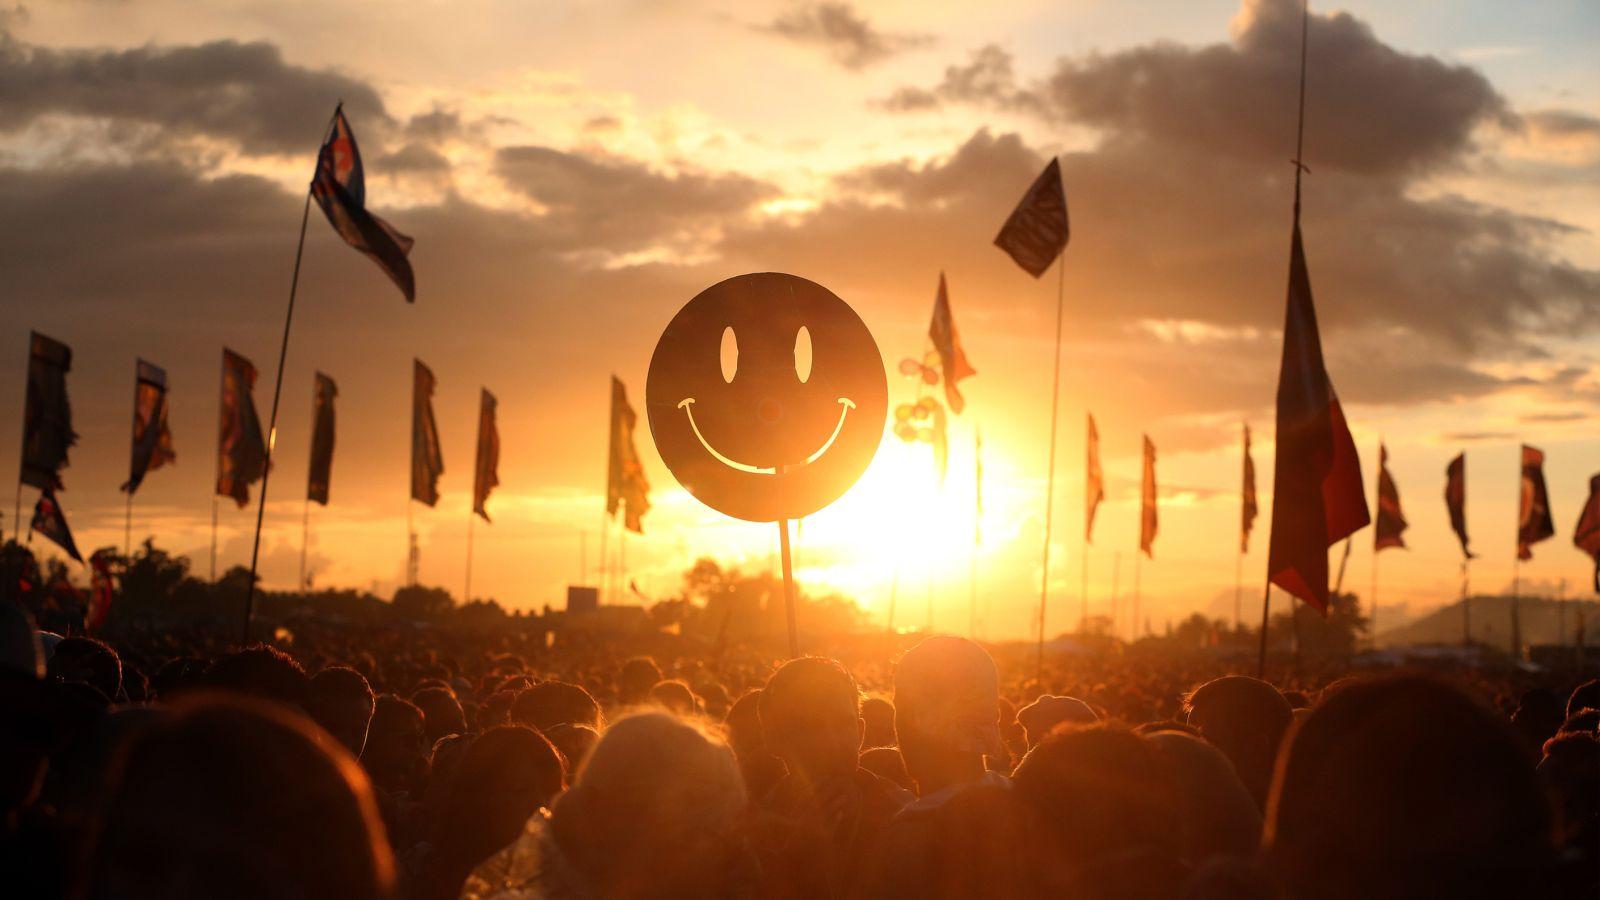 A crowd holding aloft a smiling face emoji.